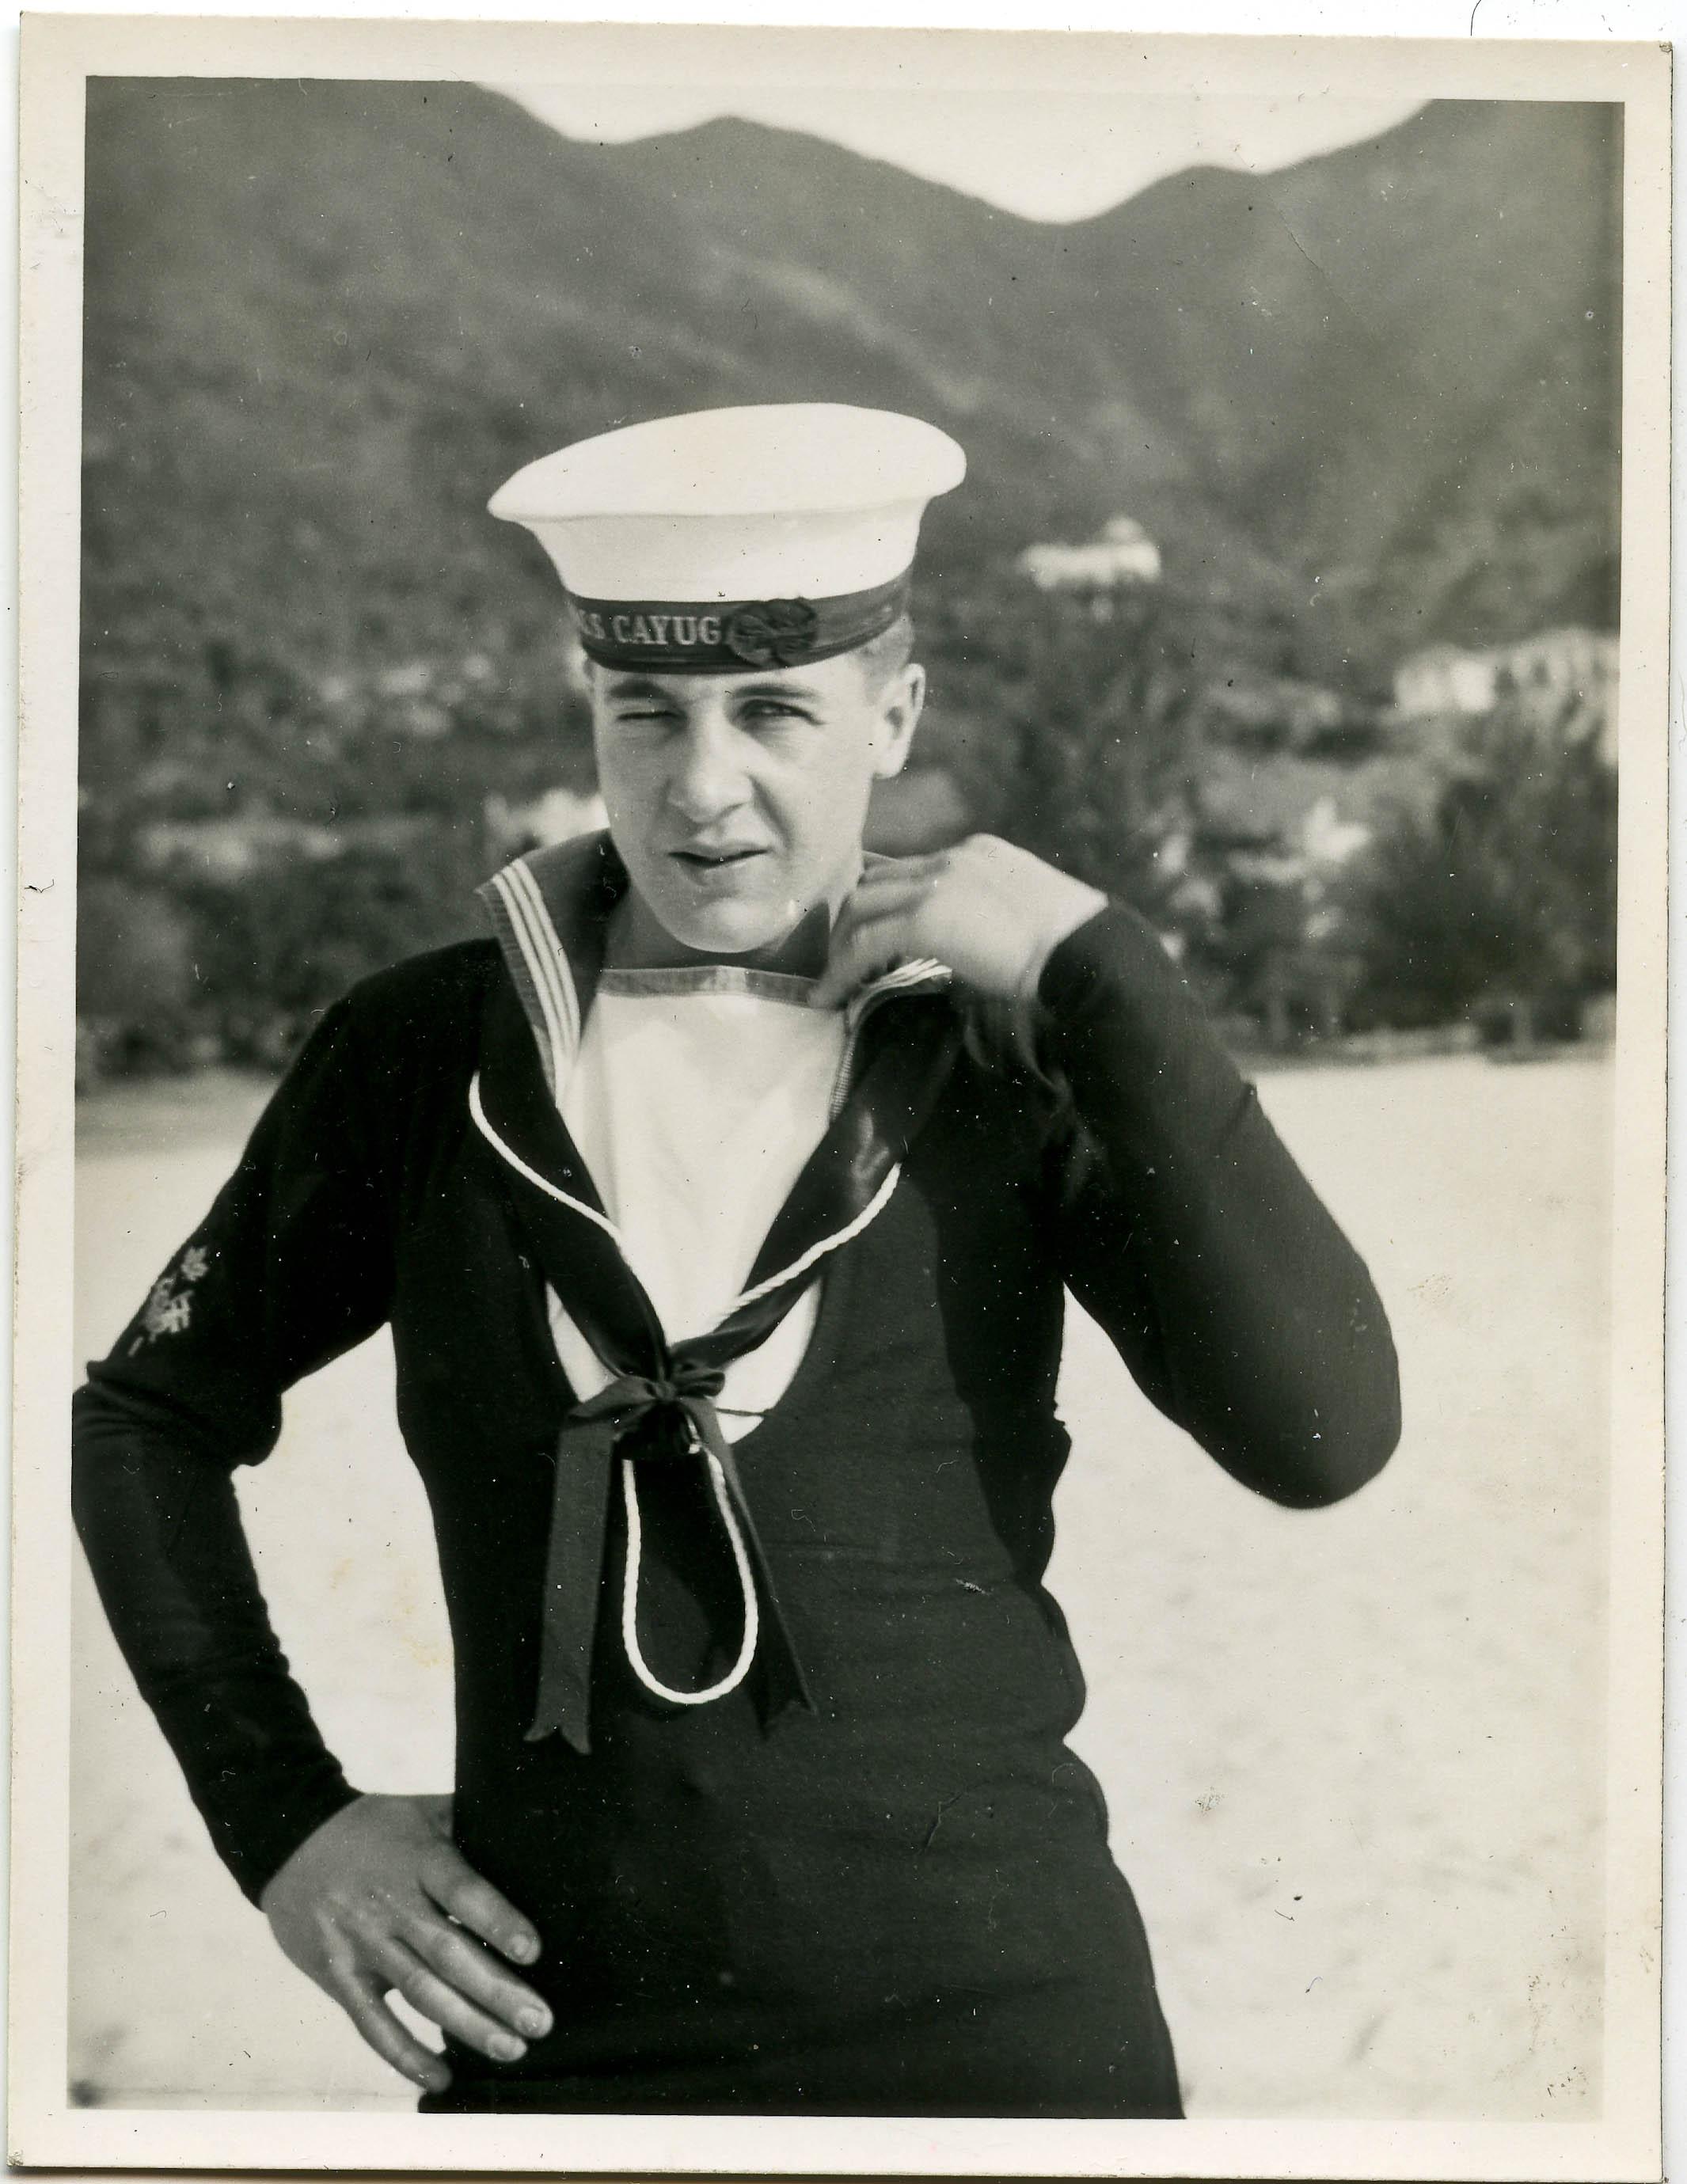 Sailor Leonard Wells of HMCS Cayuga in Korea, 1950-1952.